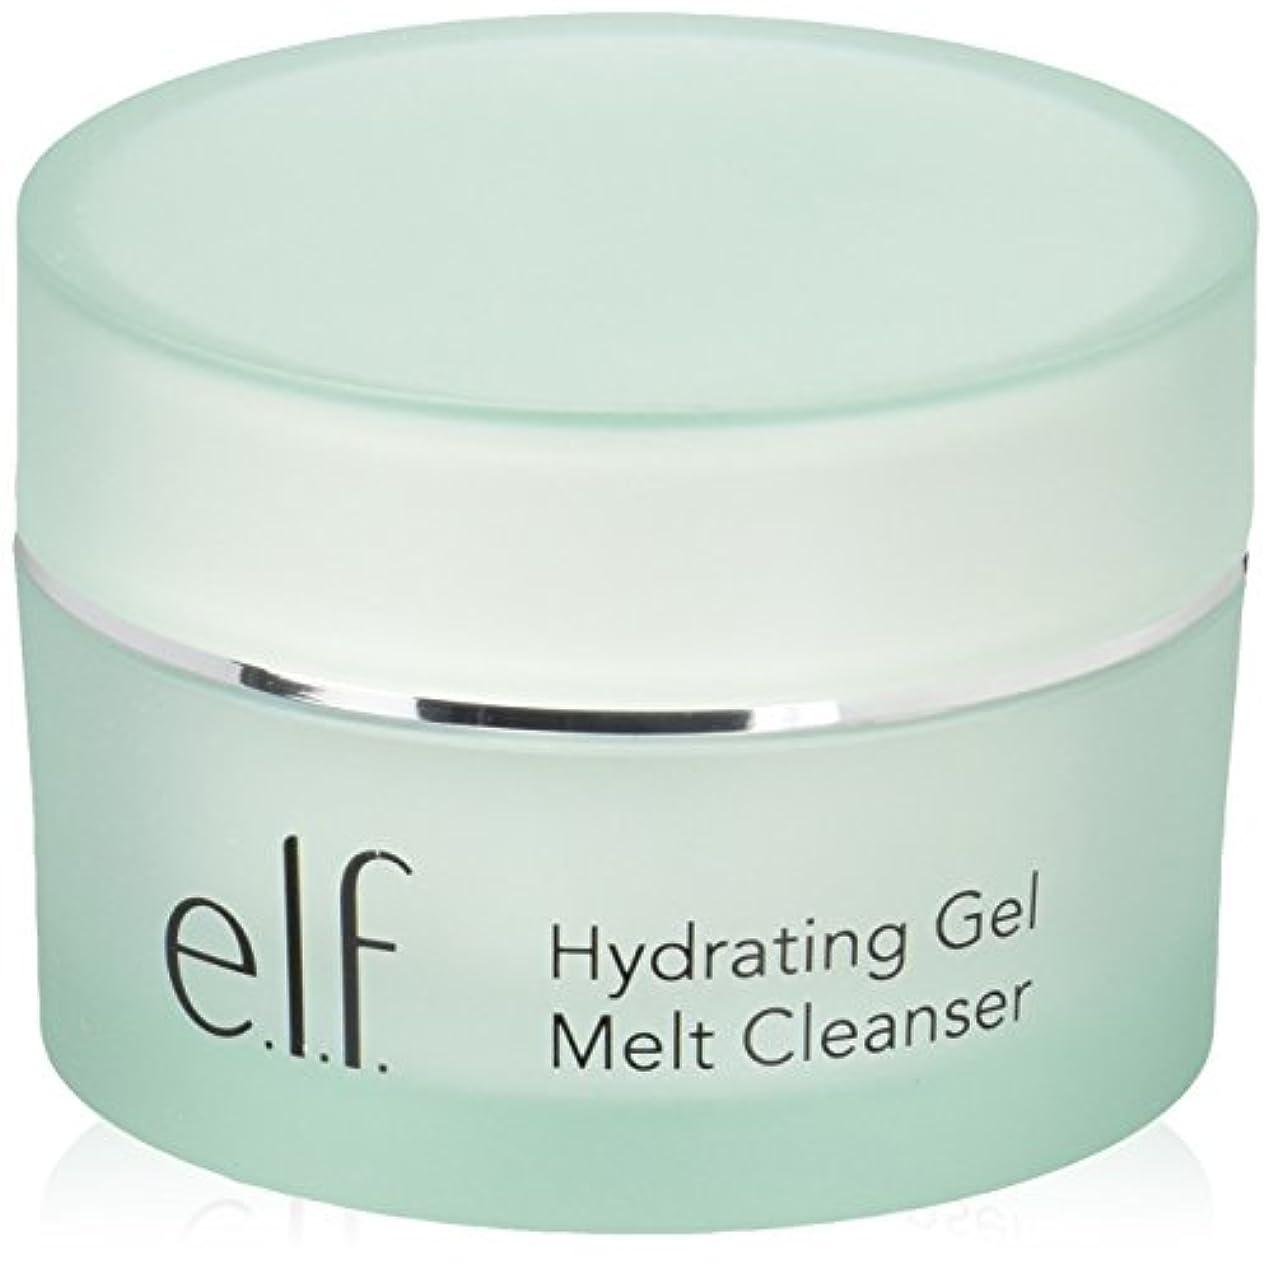 e.l.f. Hydrating Gel Melt Cleanser (並行輸入品)